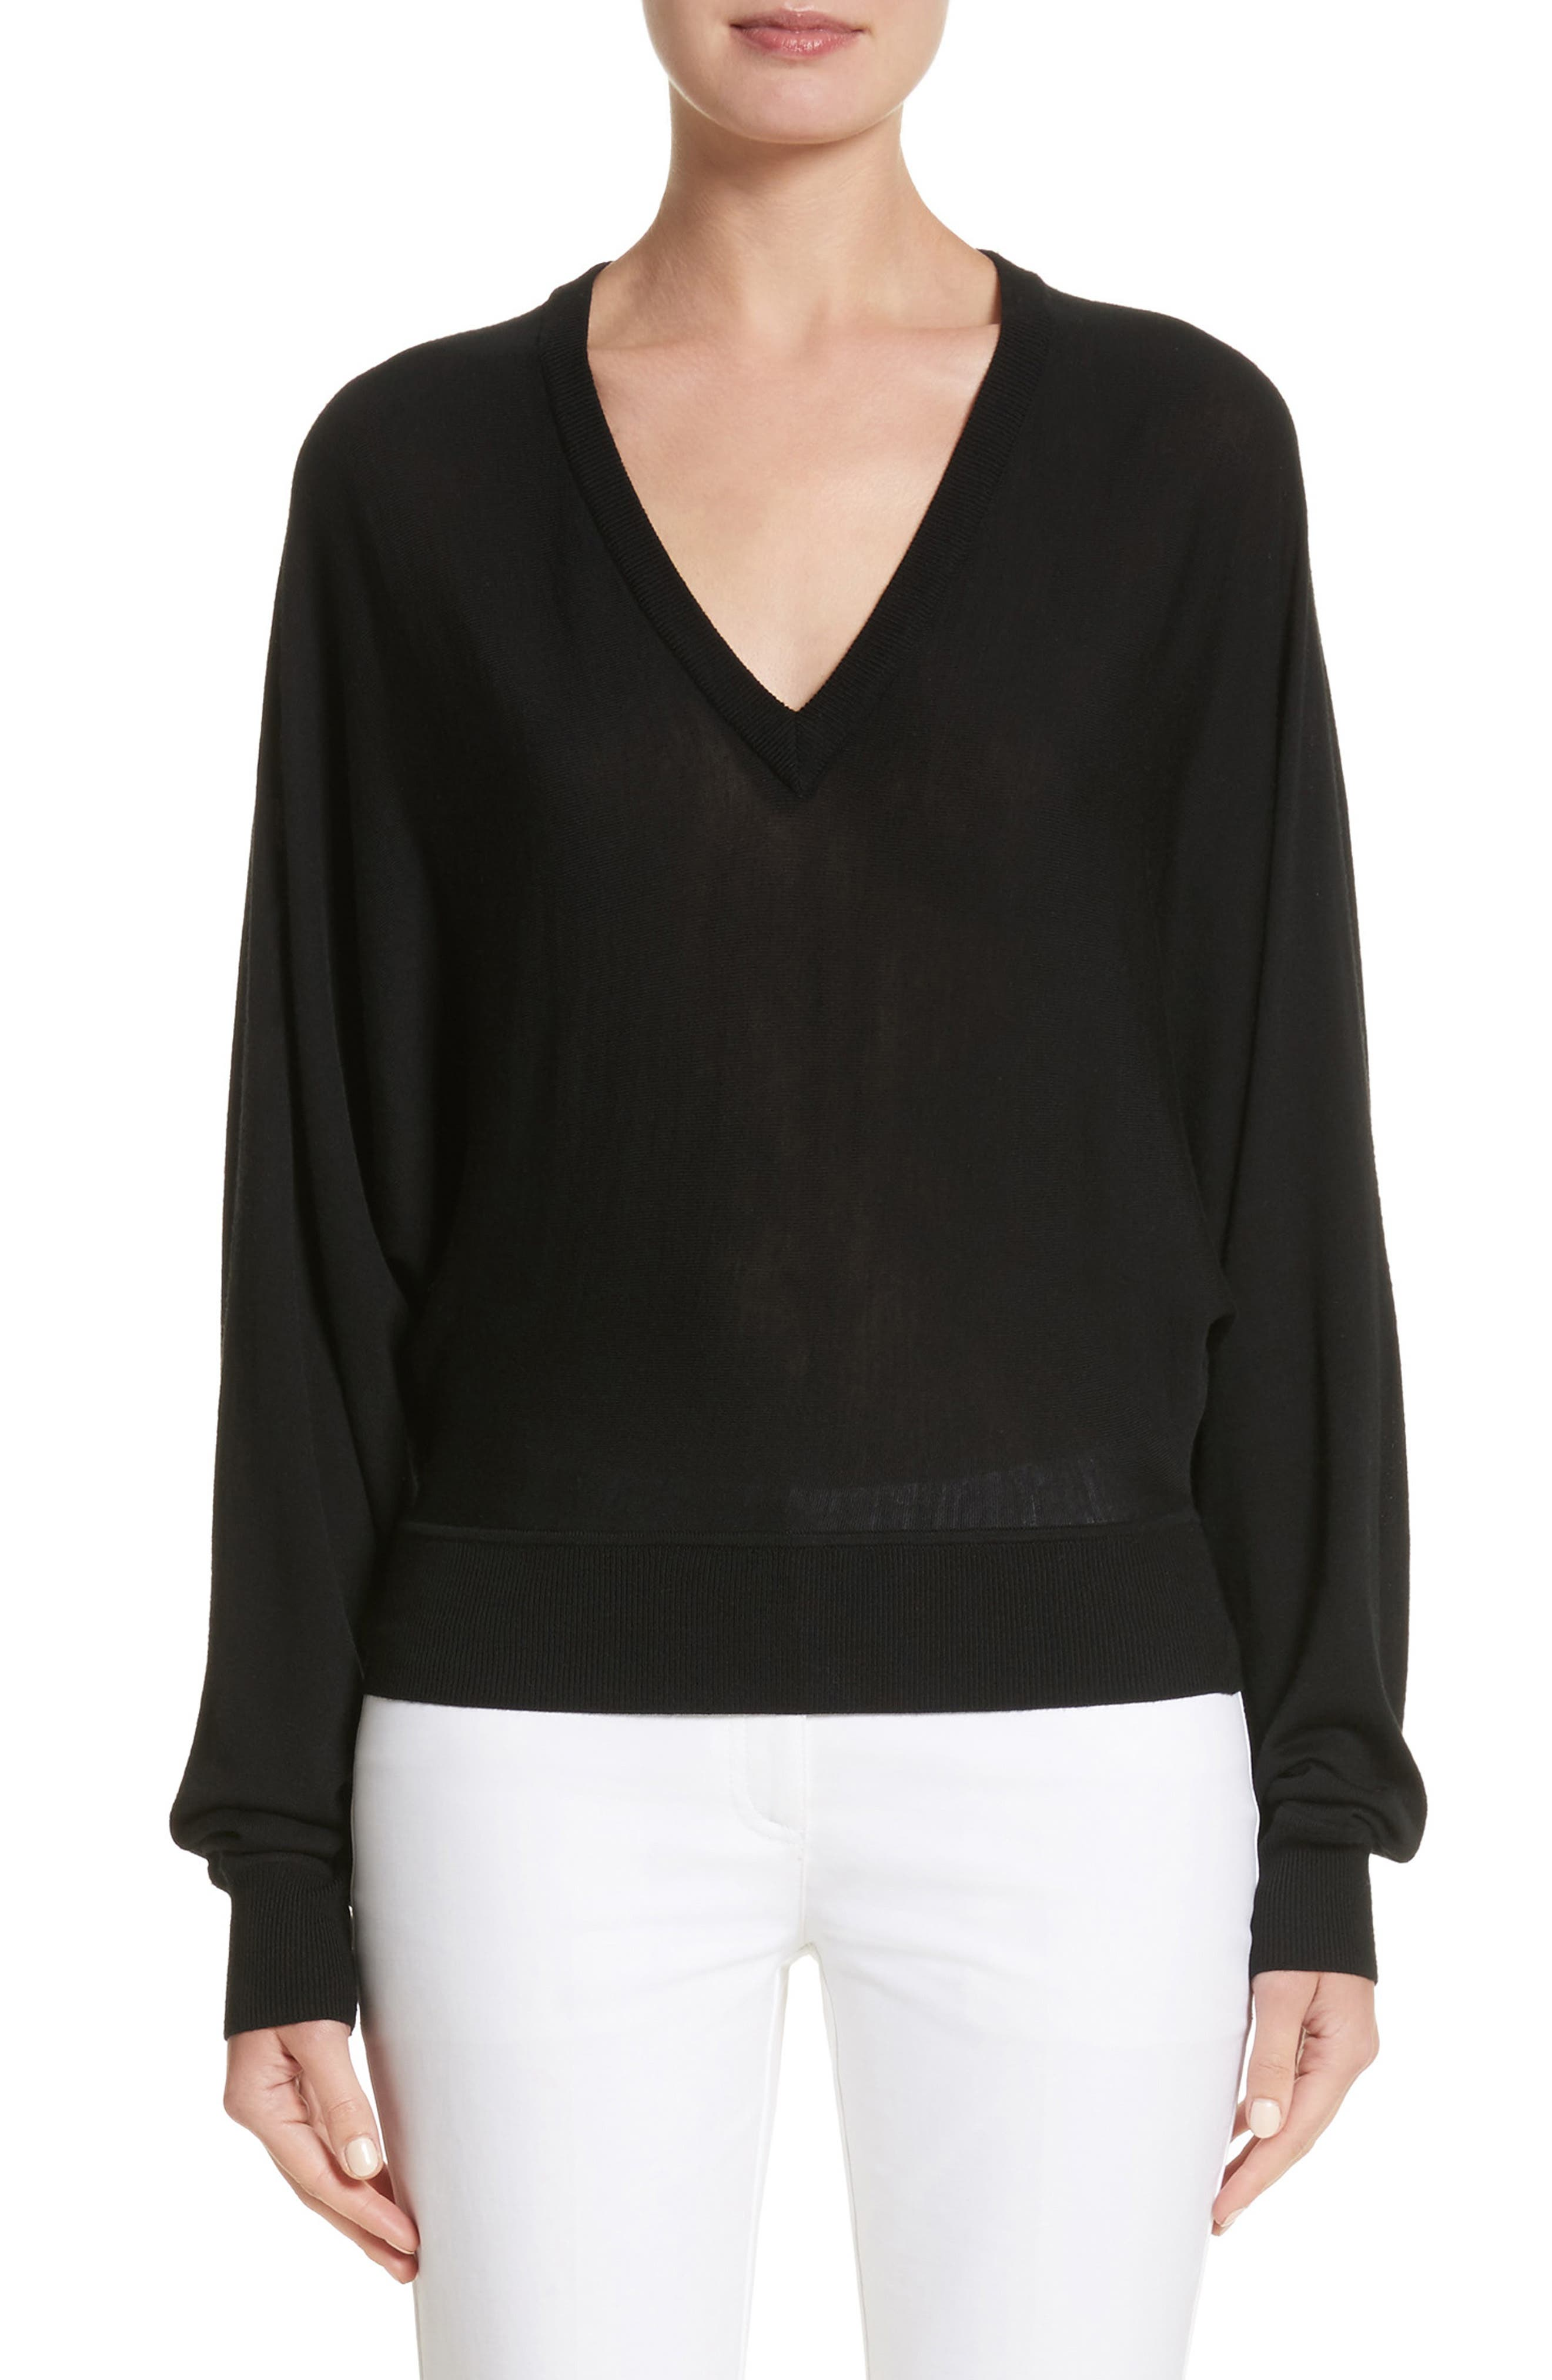 Michael Kors Merino Wool Blend Dolman Sweater